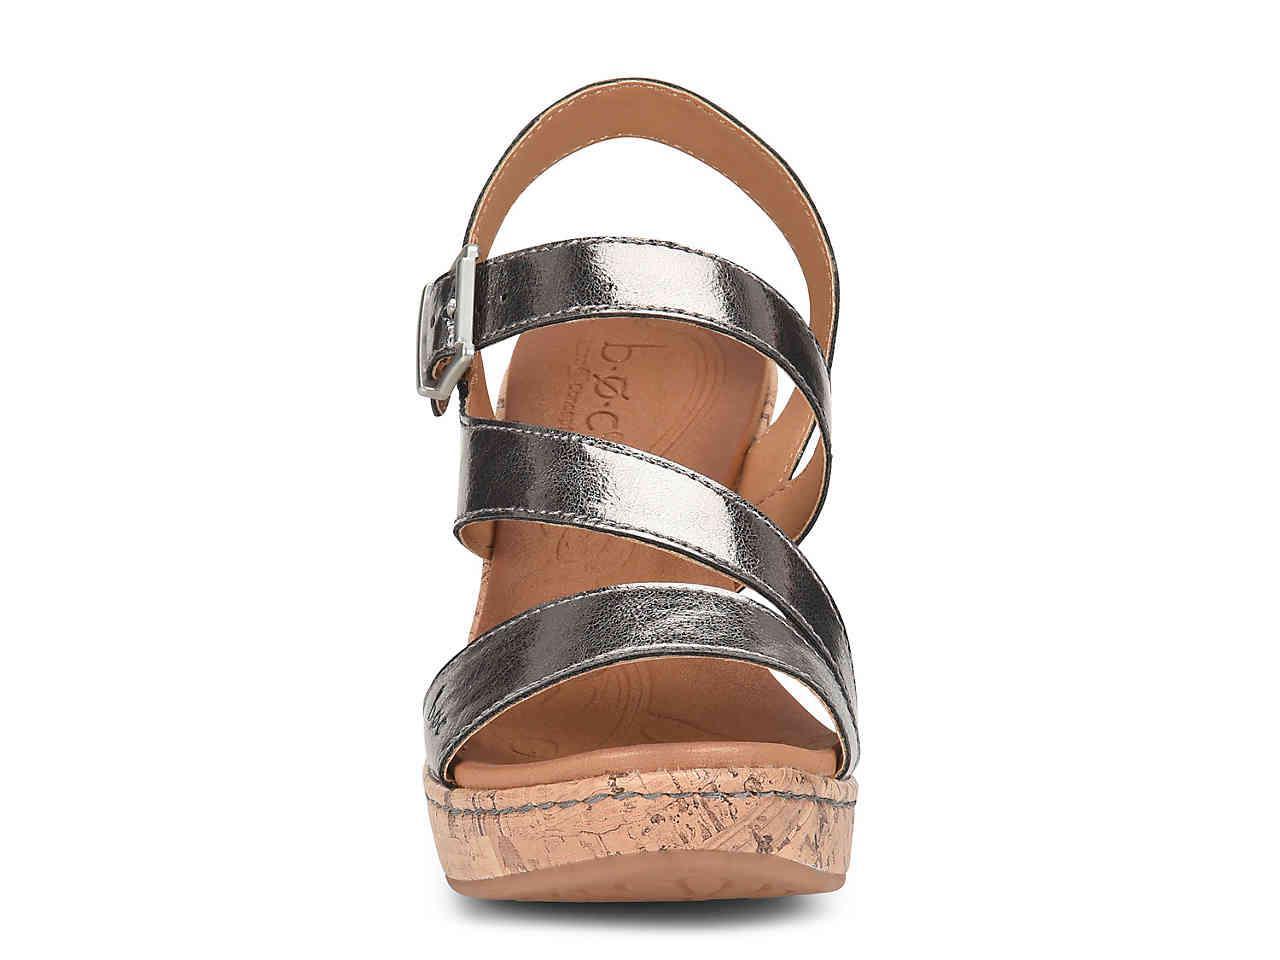 356ac888a54 Lyst - b.ø.c. Schirra Wedge Sandal in Metallic